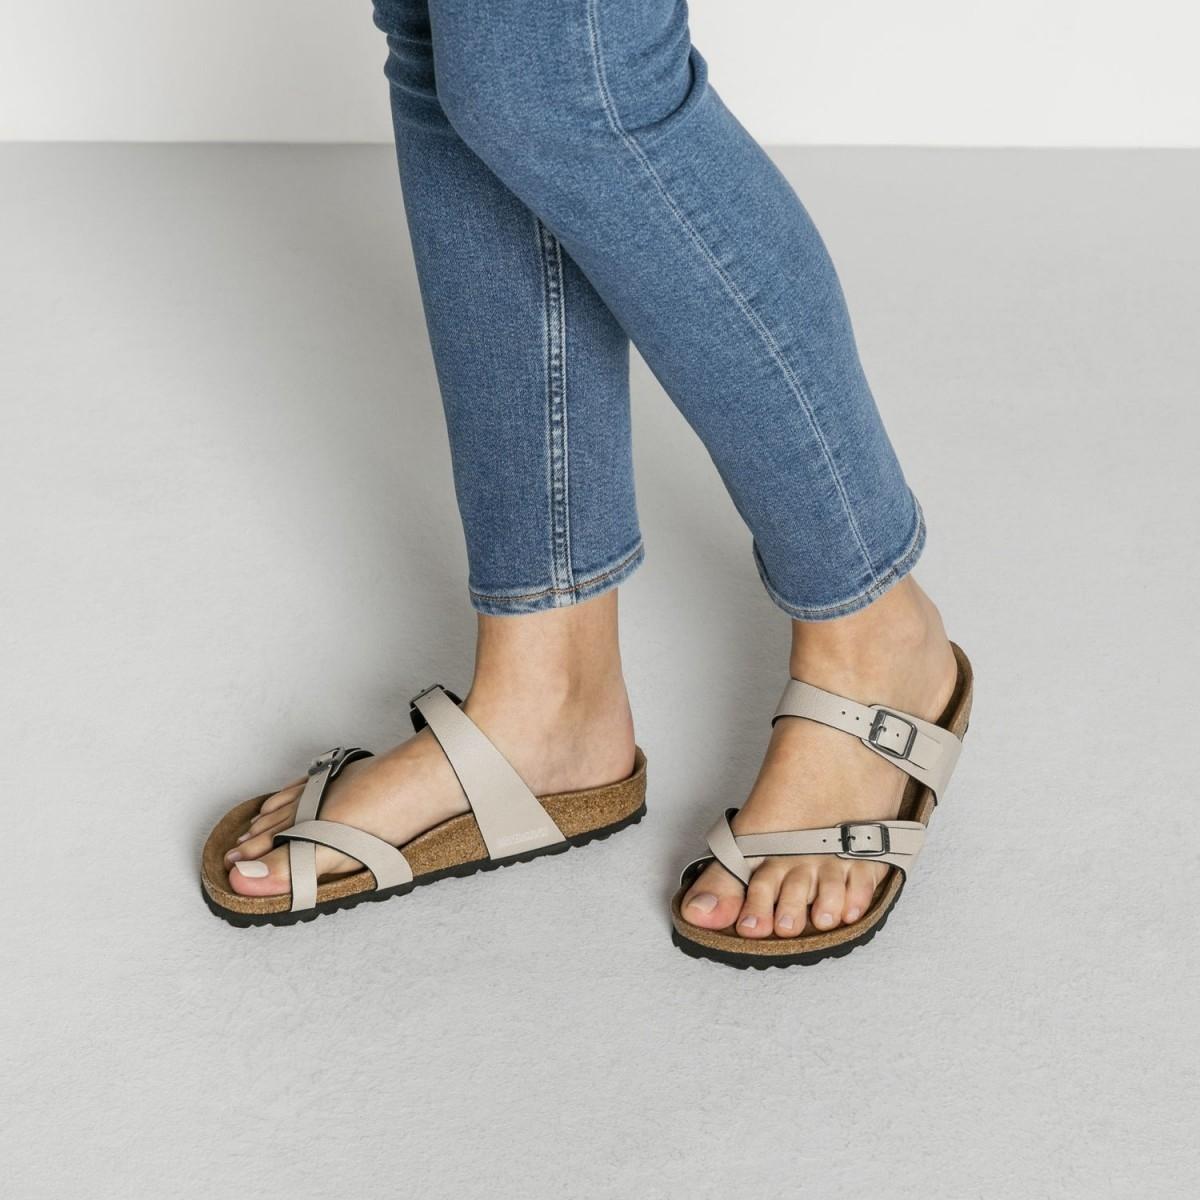 official photos cde4e 1846c Birkenstock: sandali, infradito, pianelle. Come indossarle?